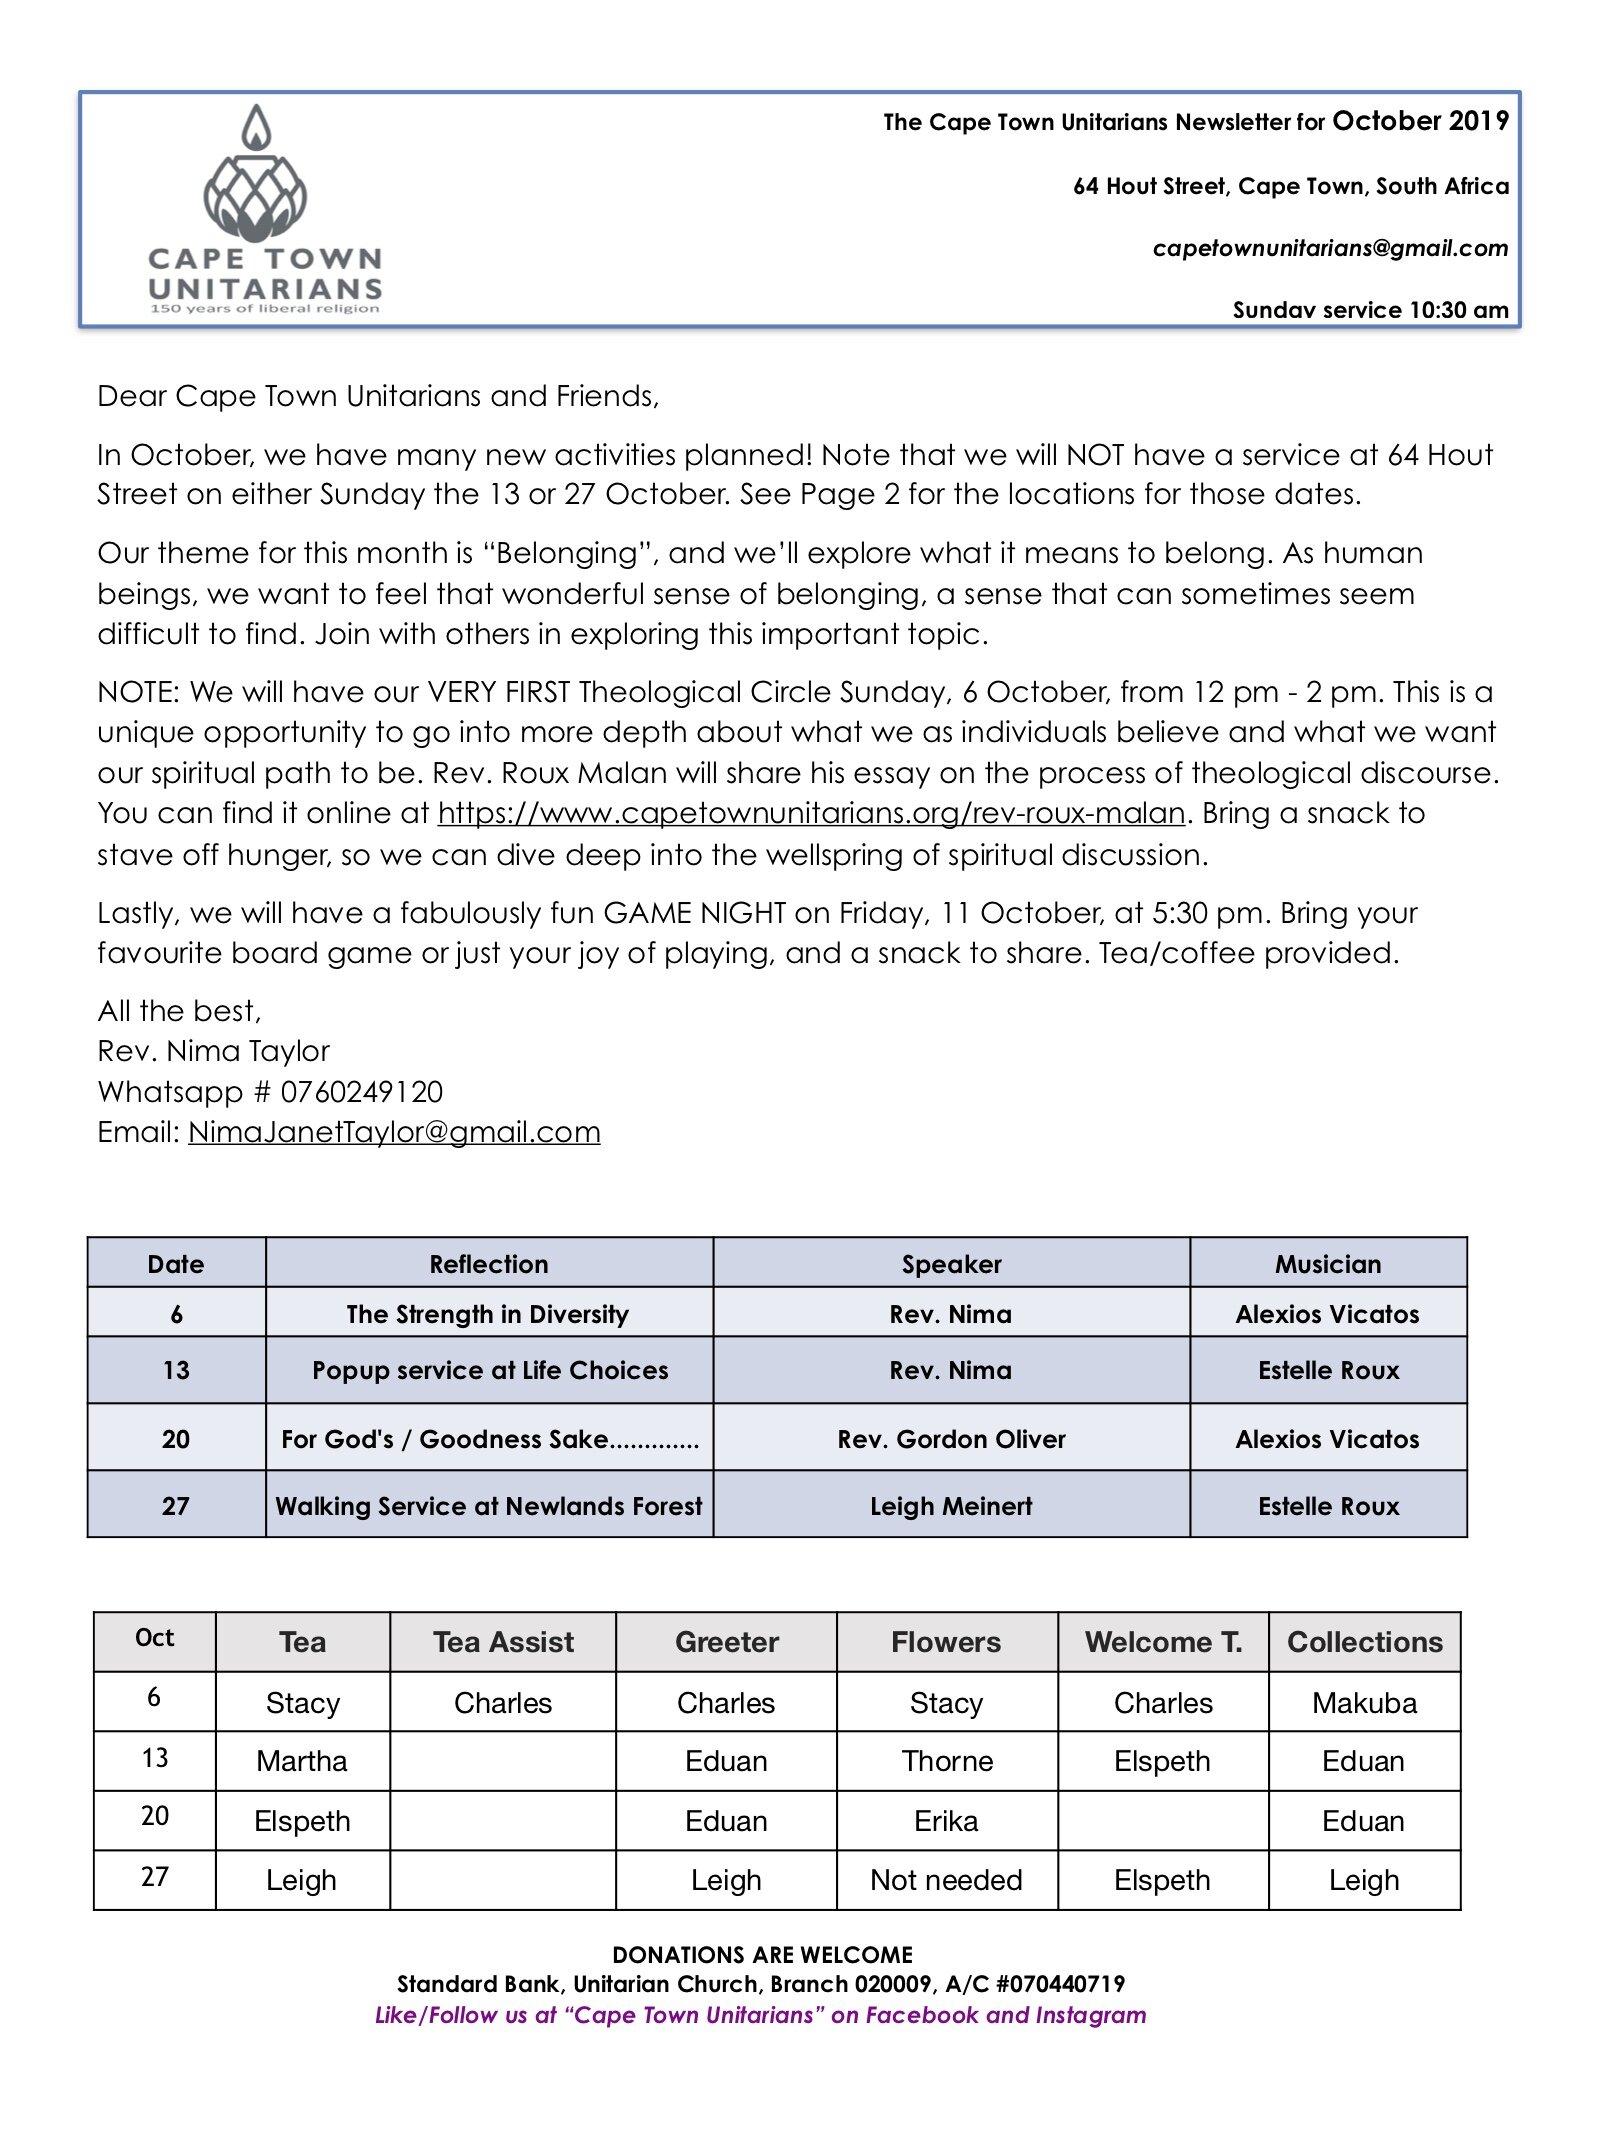 October 2019 CTU newsletter.jpg